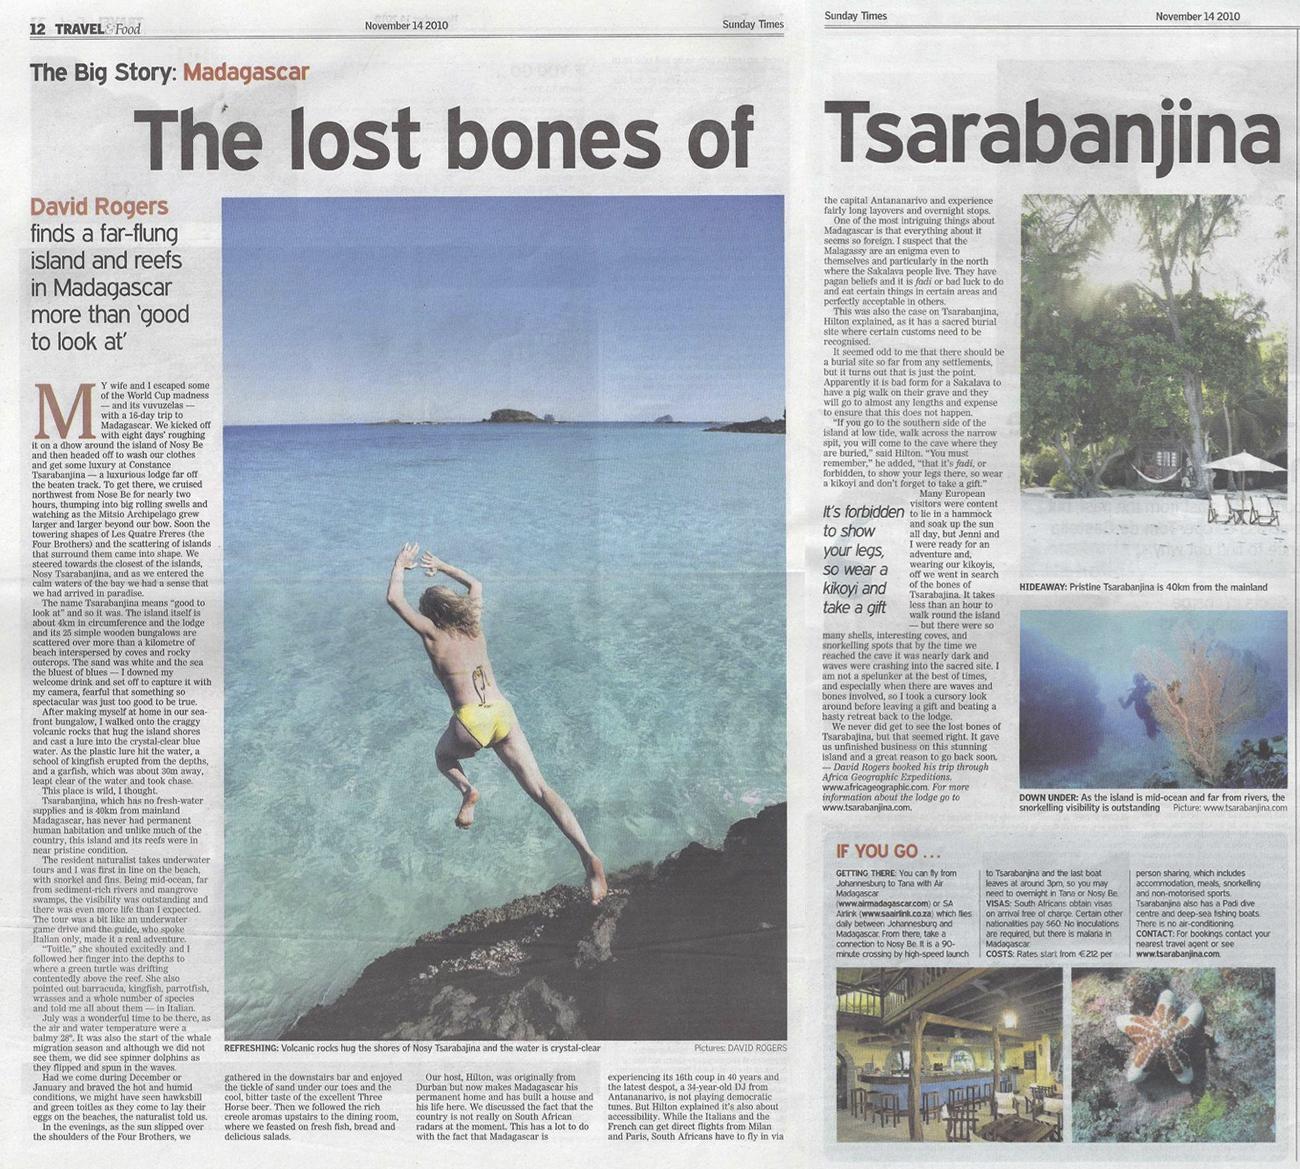 lost bones of tsarabanjina